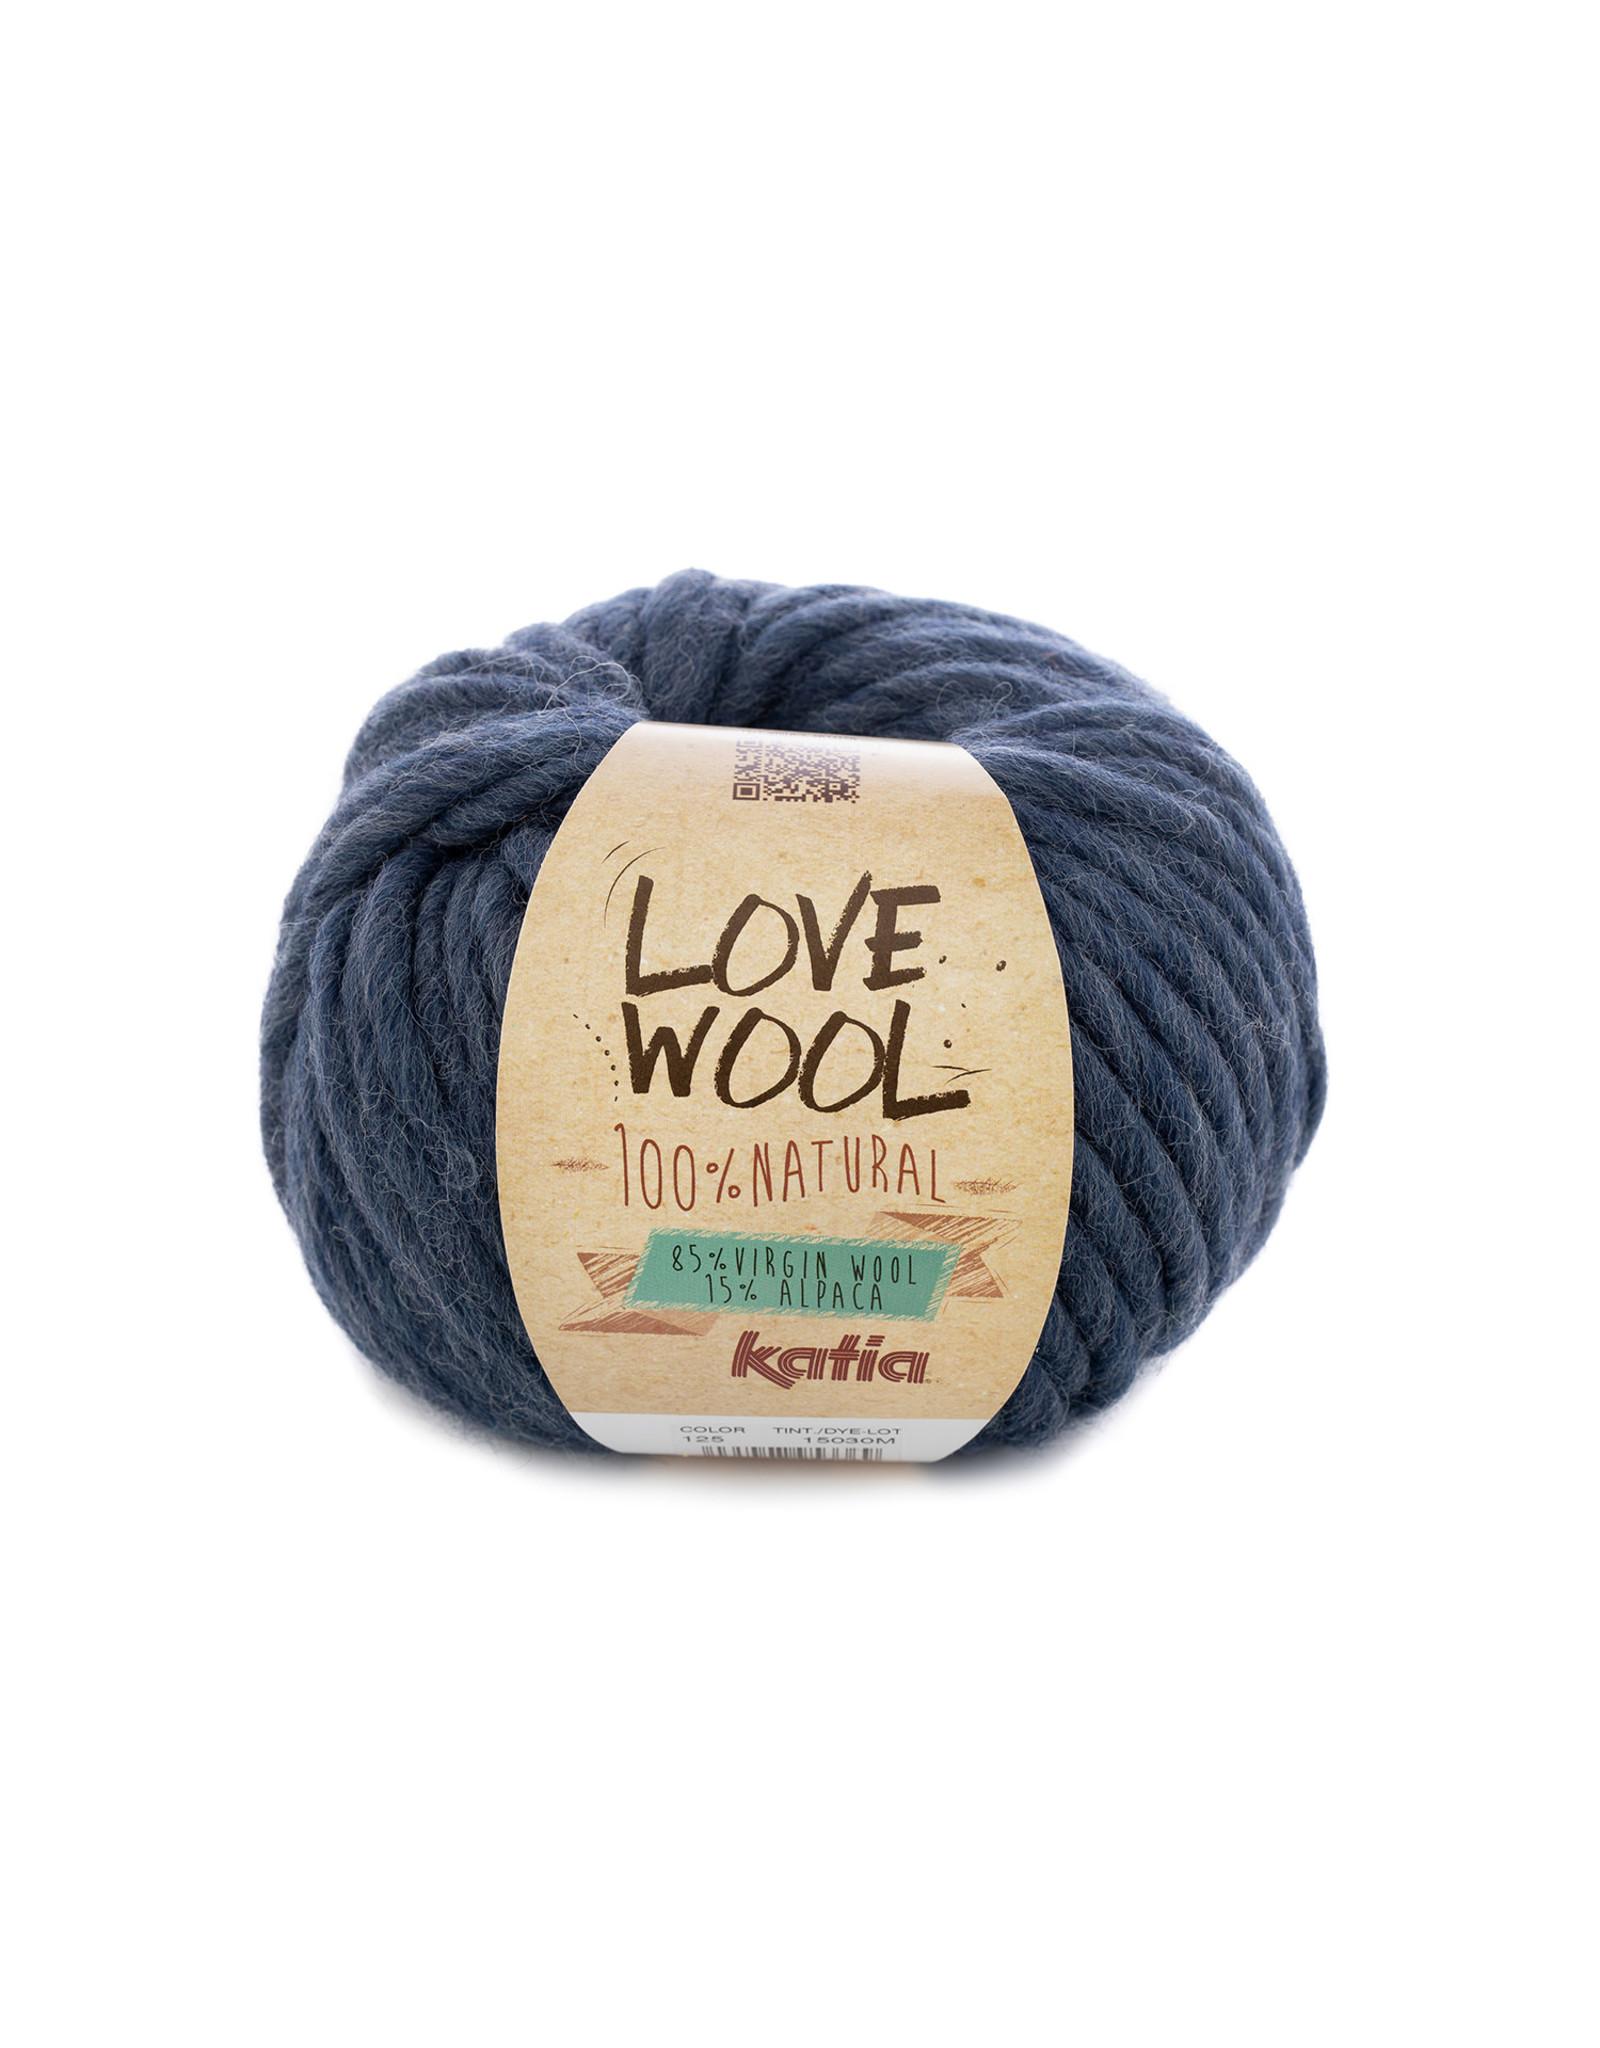 Katia Katia - Love Wool - 125 - Jeans - bundel 2 bollen x 100 gr.